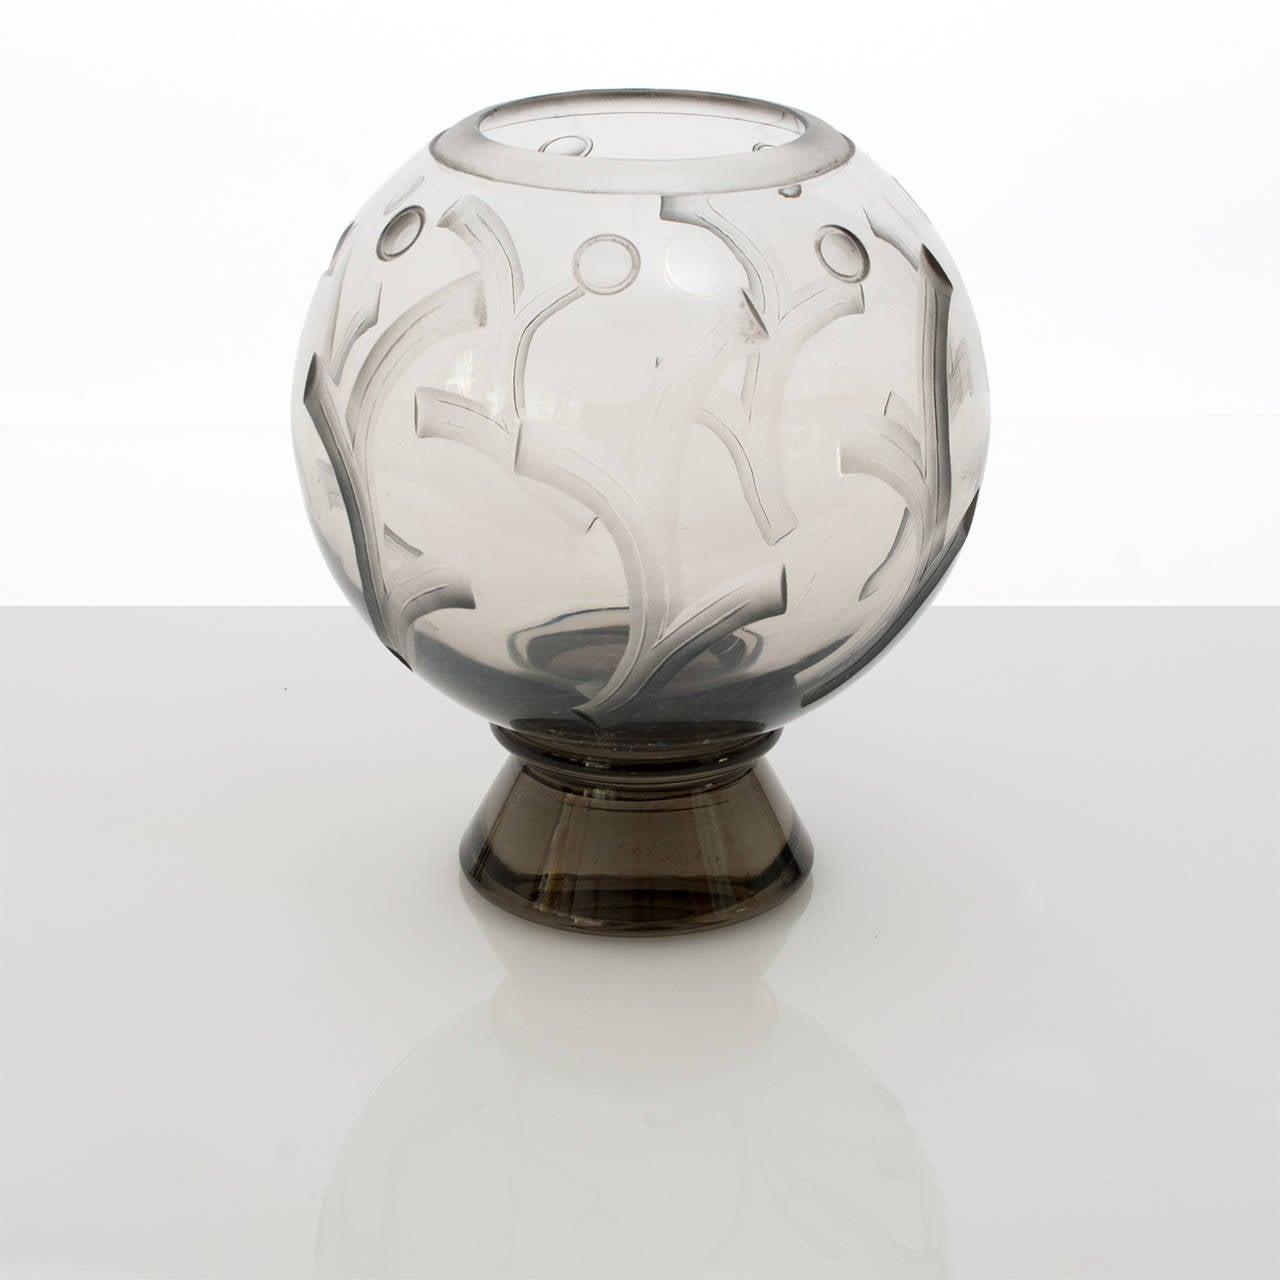 Scandinavian modern art deco etched glass vase by simon gate for swedish scandinavian modern art deco etched glass vase by simon gate for orrefors for sale reviewsmspy